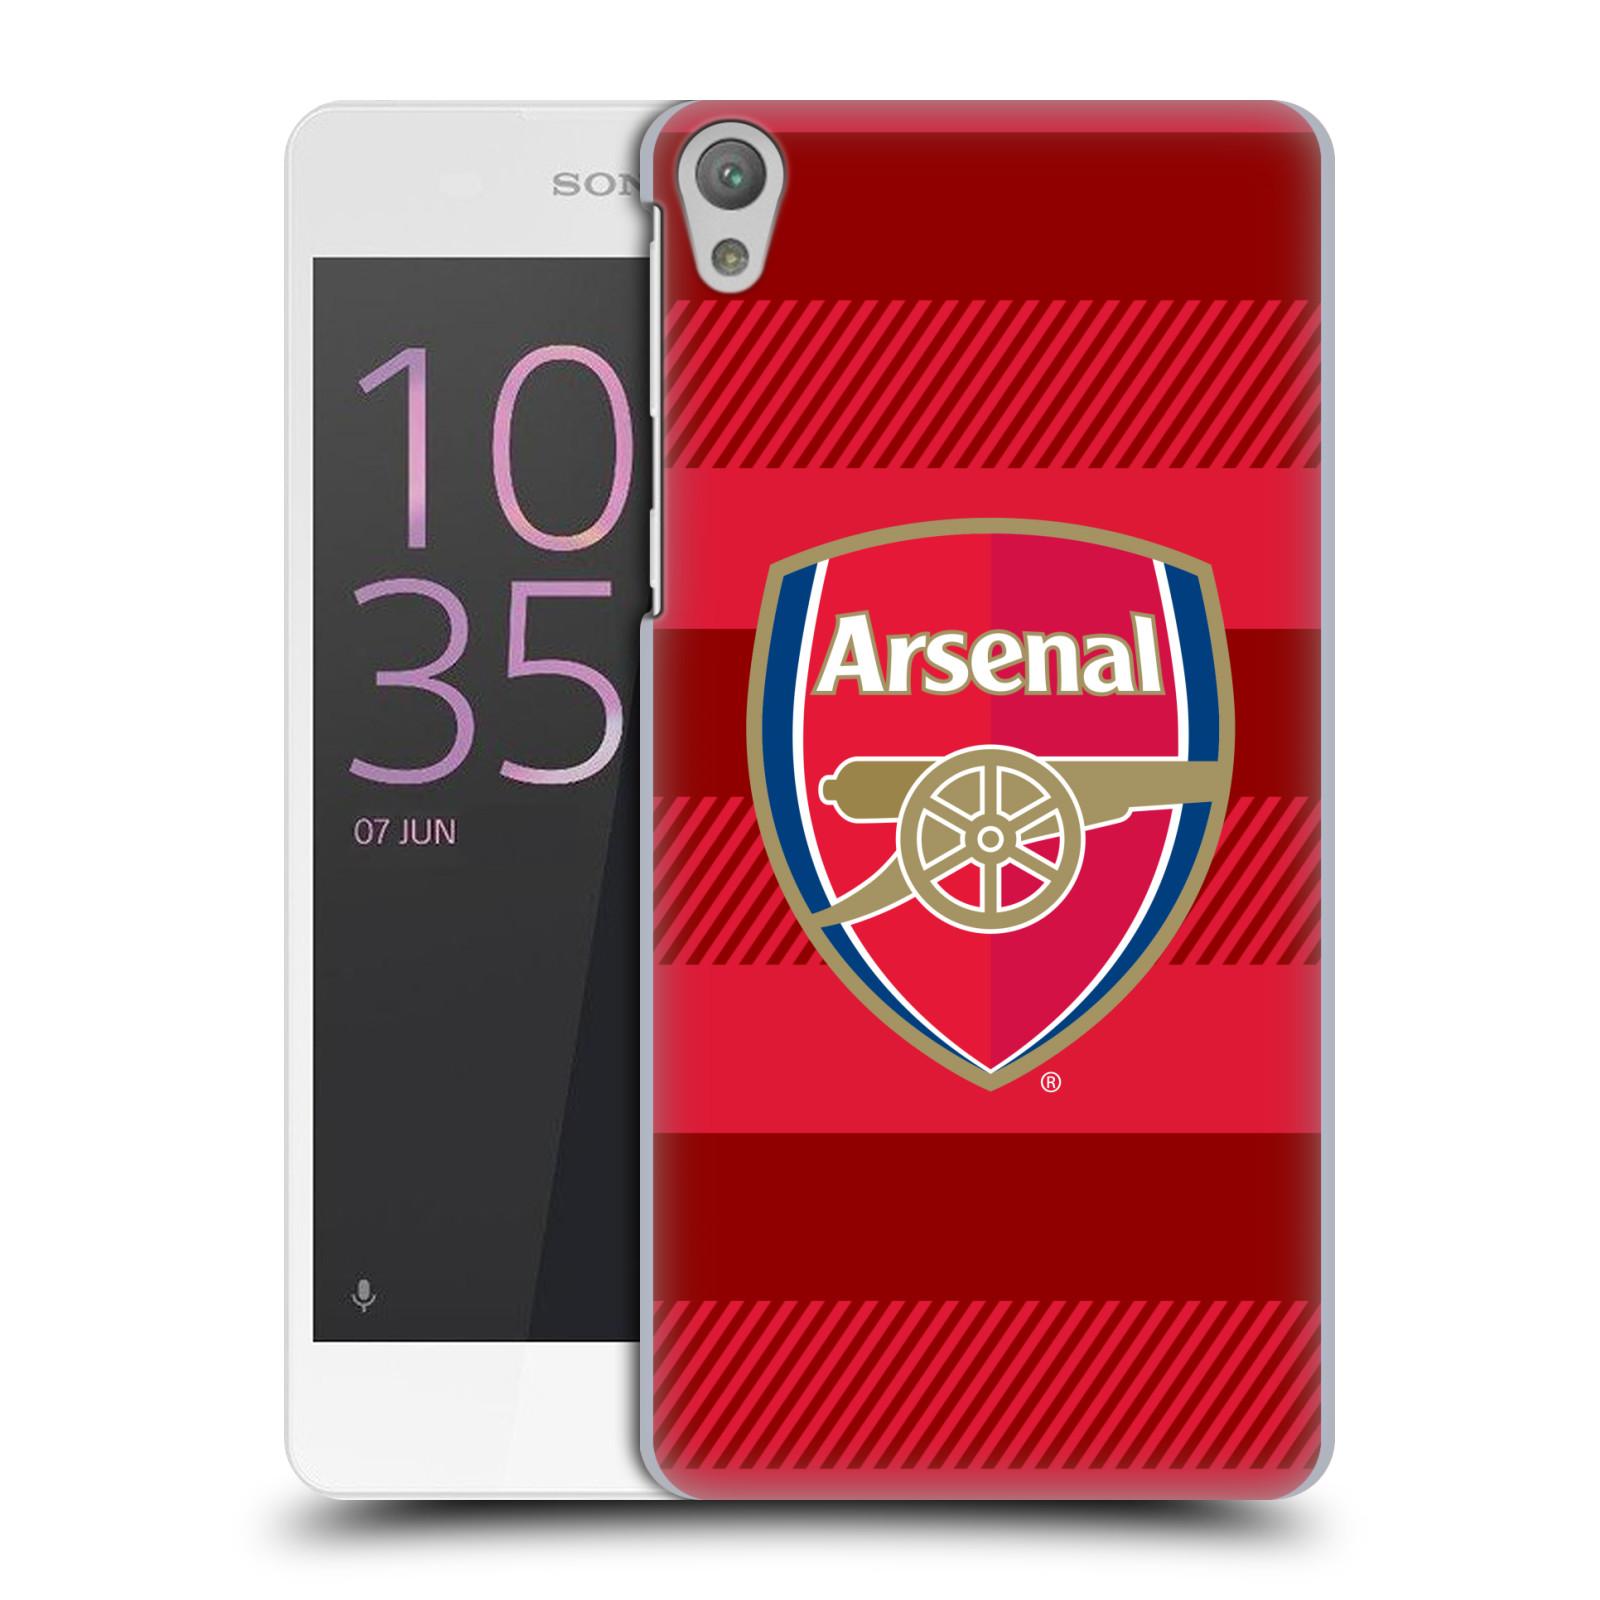 Plastové pouzdro na mobil Sony Xperia E5 - Head Case - Arsenal FC - Logo s pruhy